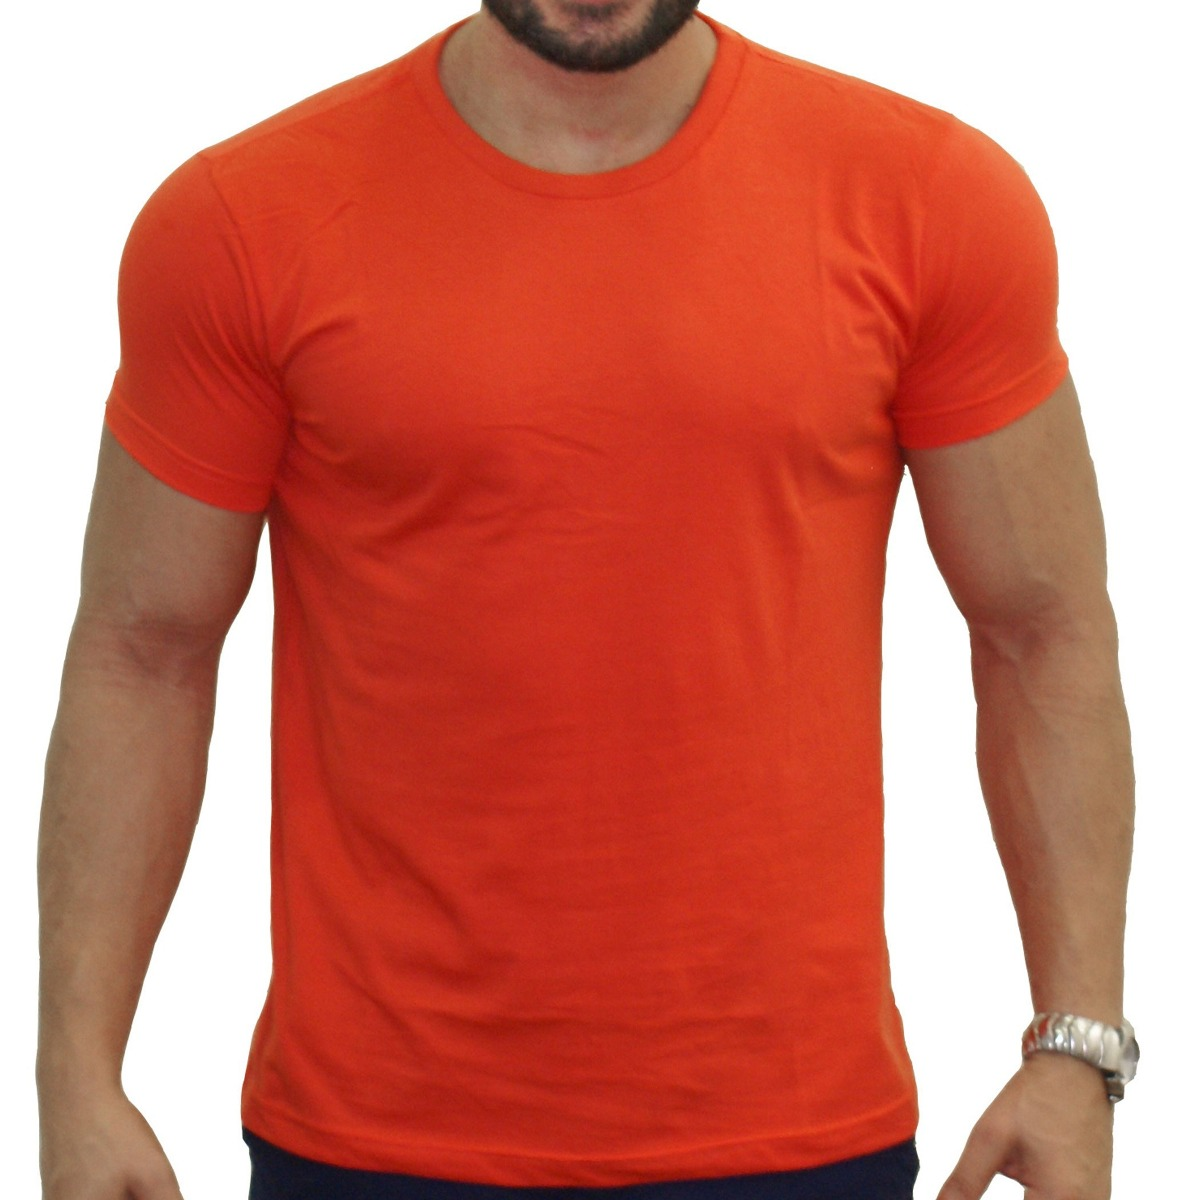 camisa masculina laranja lisa 100% algodão empório armani. Carregando zoom. 1cd88bc82ef